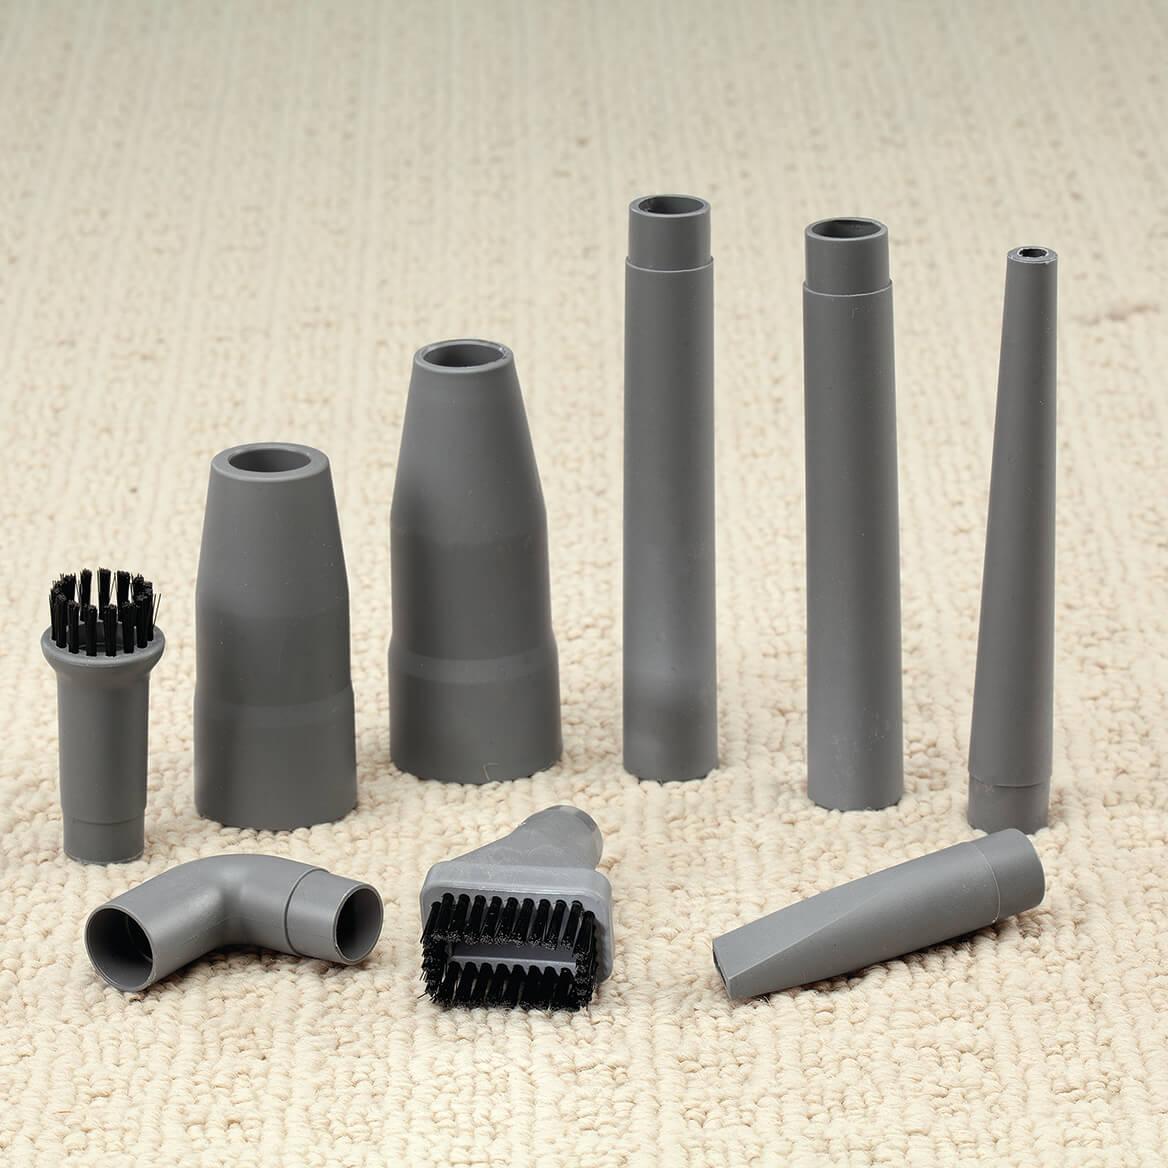 Mini Vacuum Attachments 9 Piece Set-371832